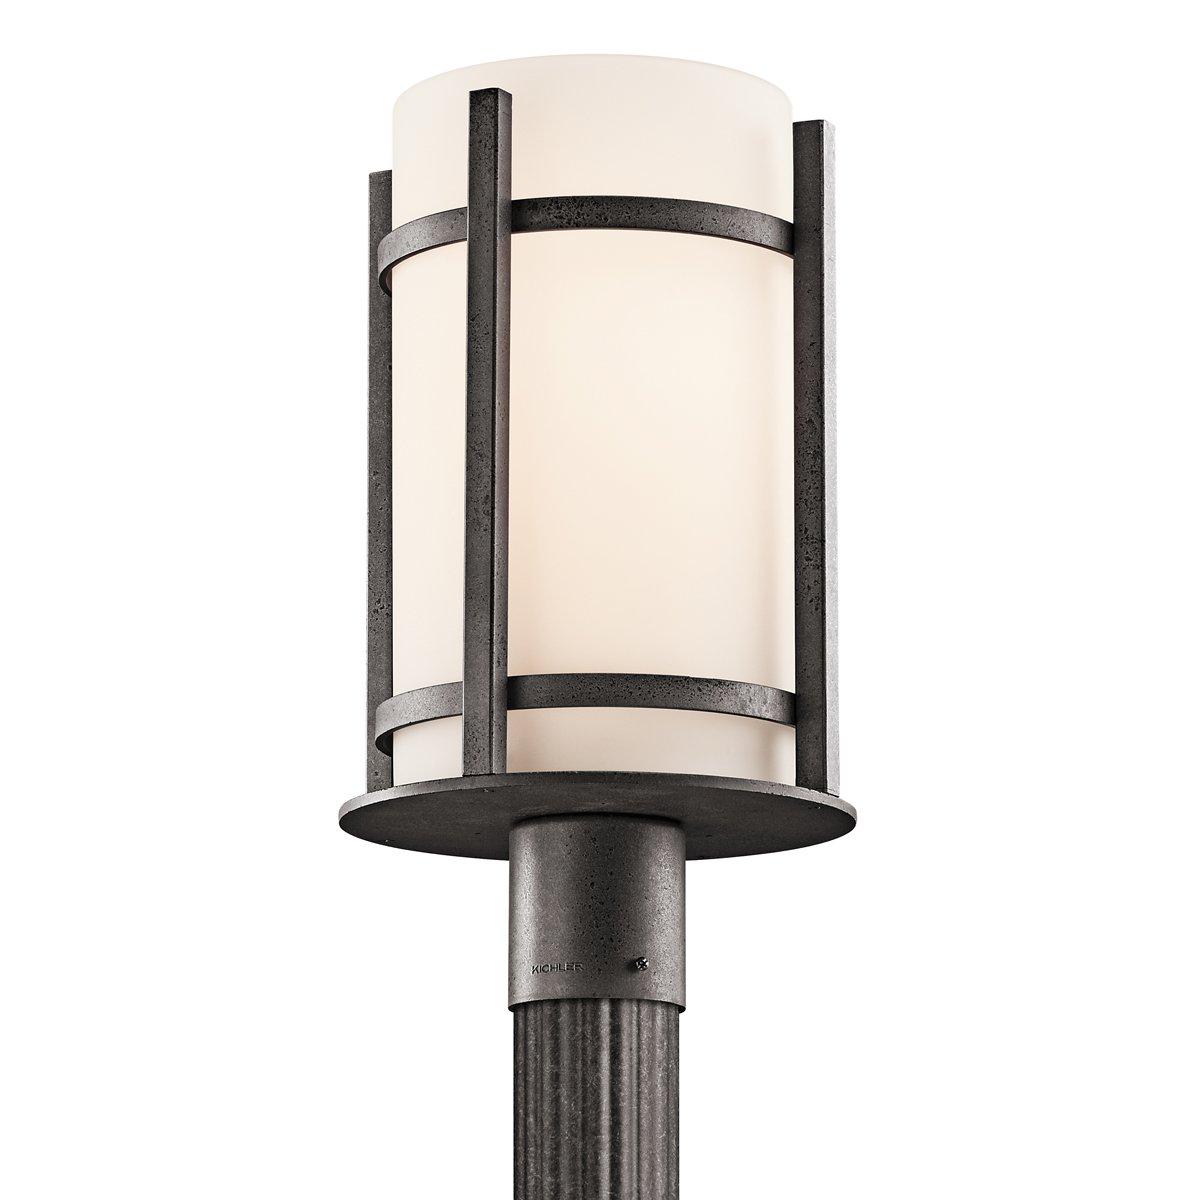 Amazon kichler 49123avi camden outdoor post lantern in anvil amazon kichler 49123avi camden outdoor post lantern in anvil iron garden outdoor mozeypictures Images